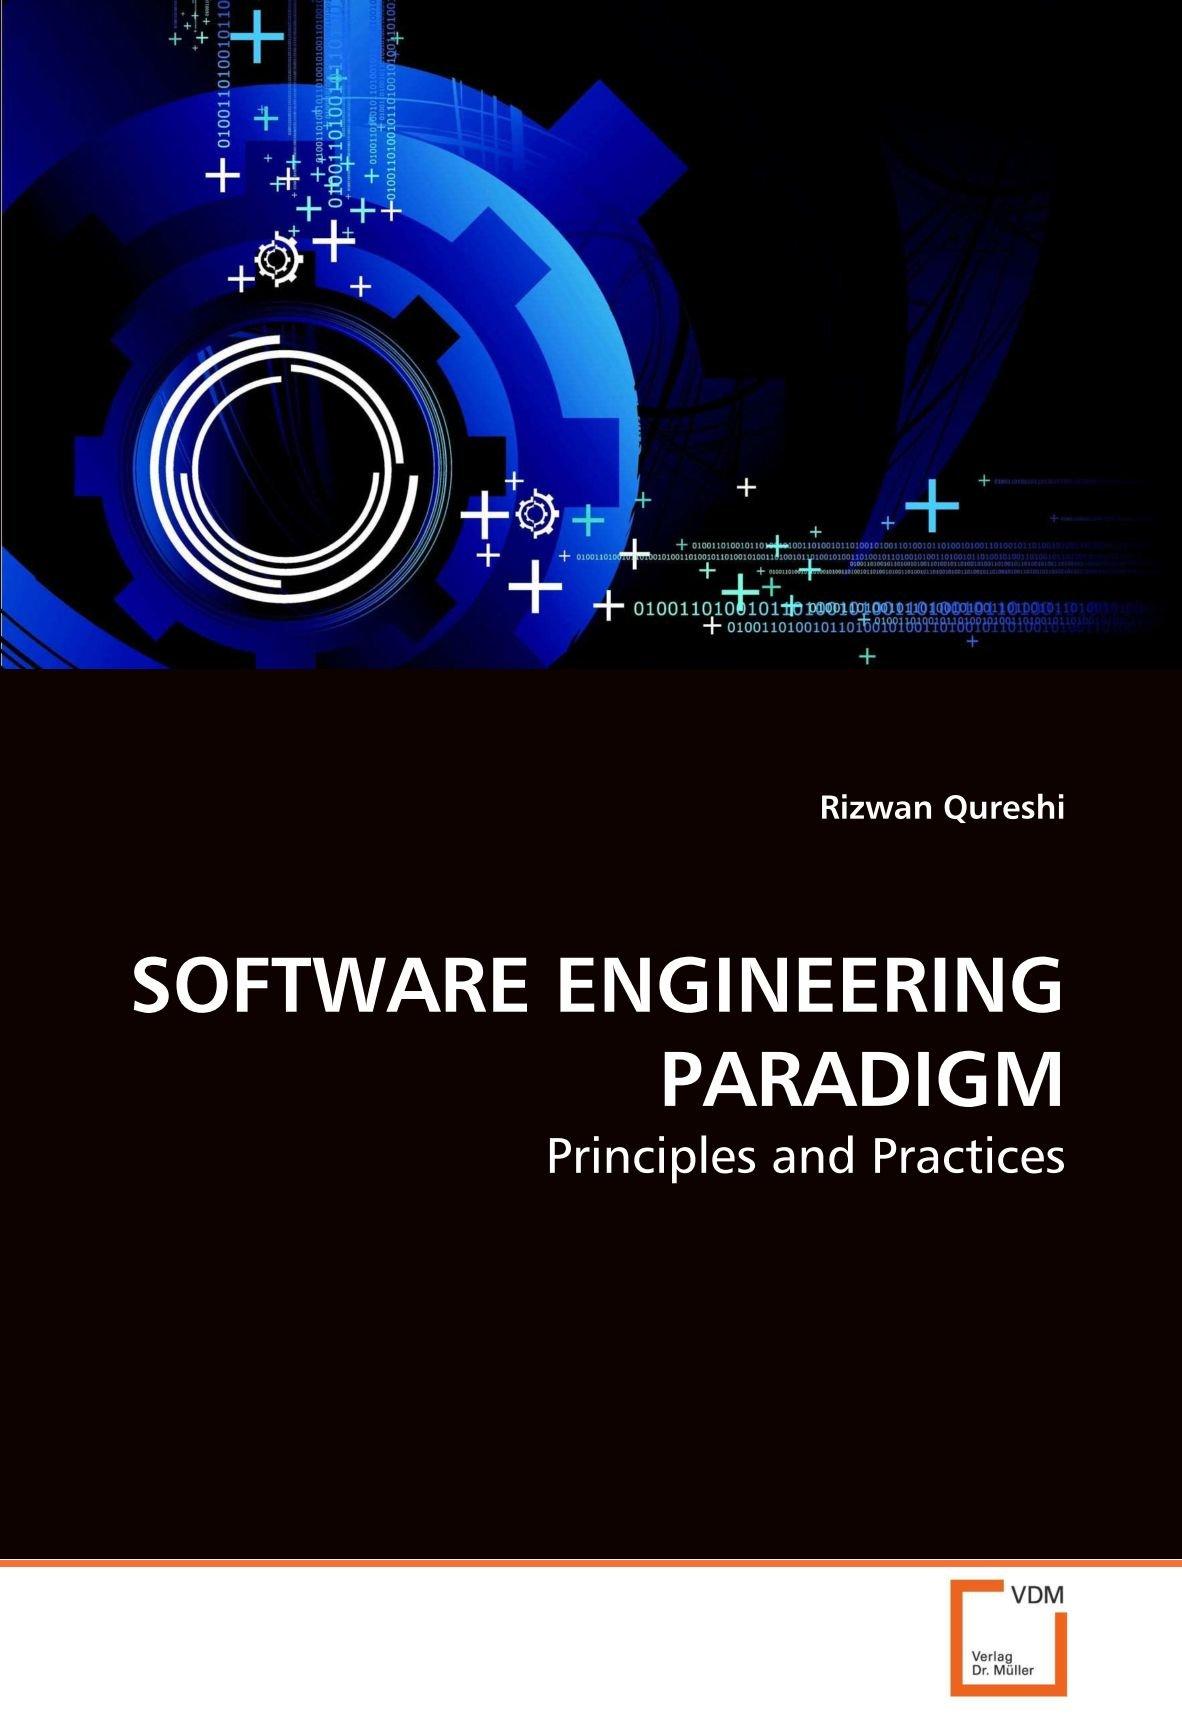 Software Engineering Paradigm Principles And Practices Qureshi Rizwan 9783639261455 Amazon Com Books